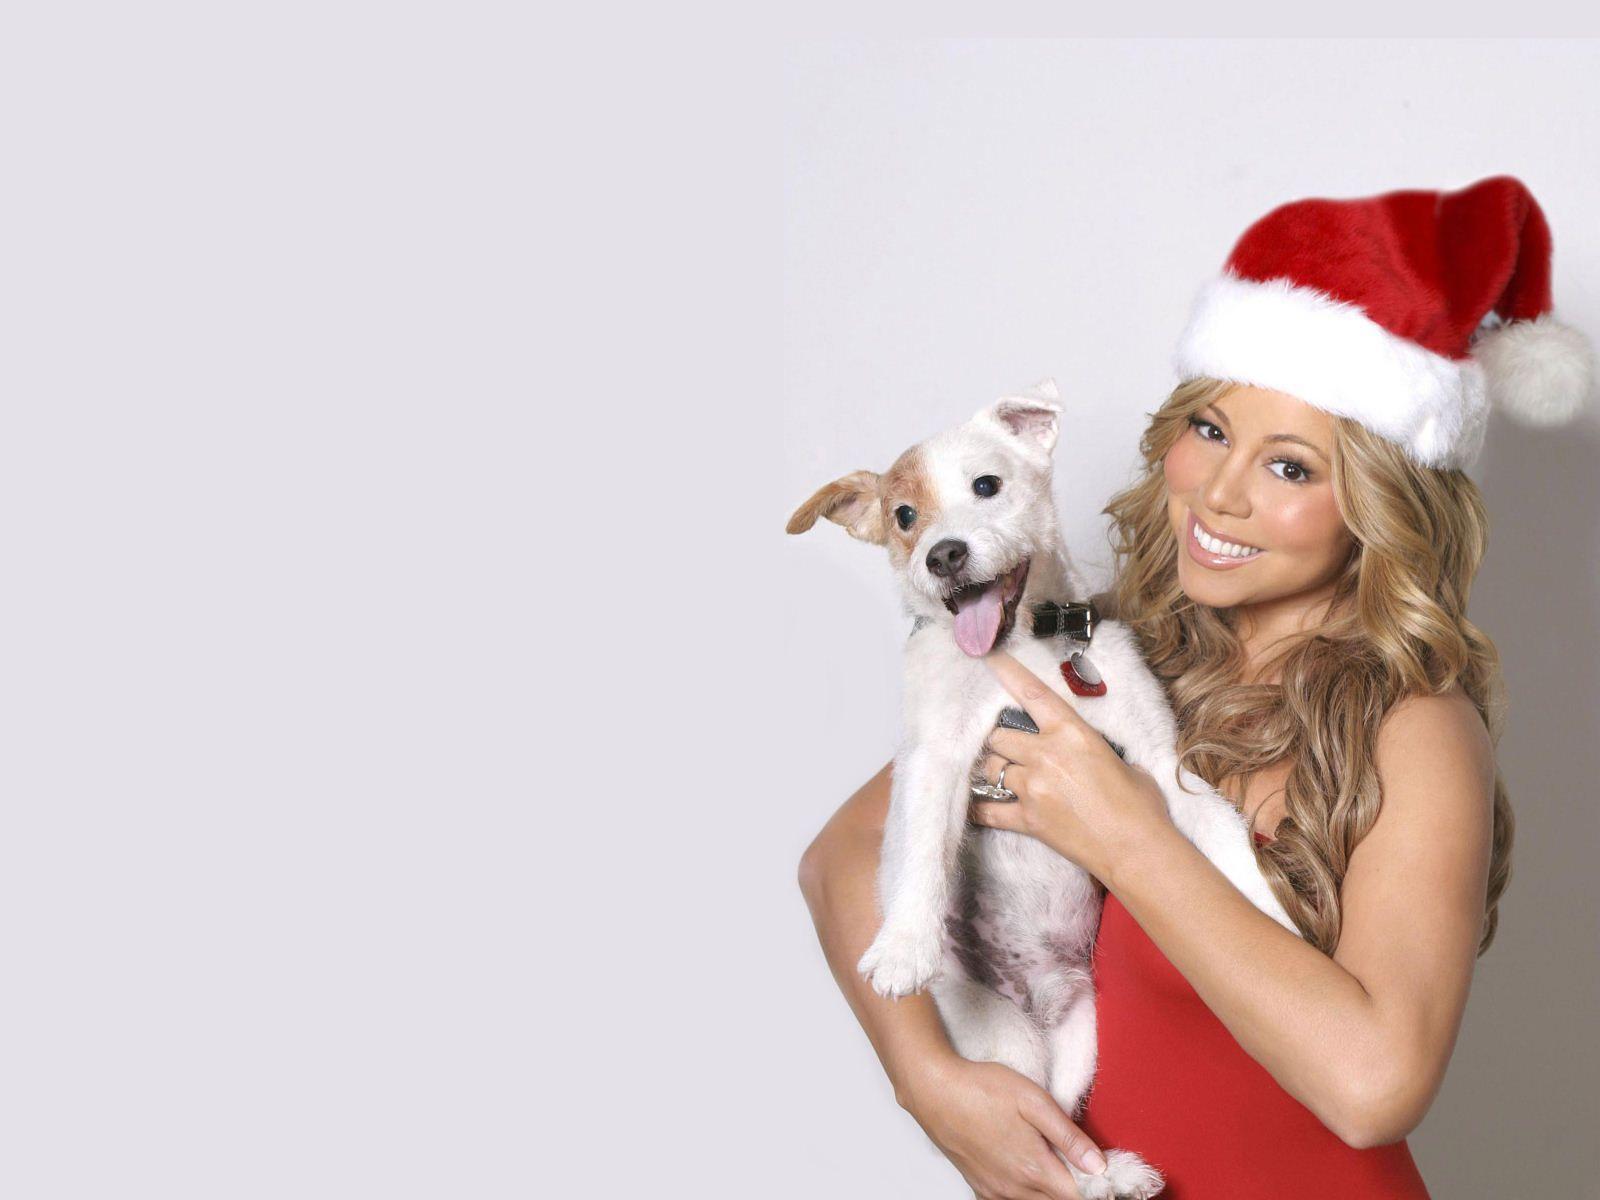 Mariah Carey Christmas Wallpapers - Top Free Mariah Carey Christmas Backgrounds - WallpaperAccess